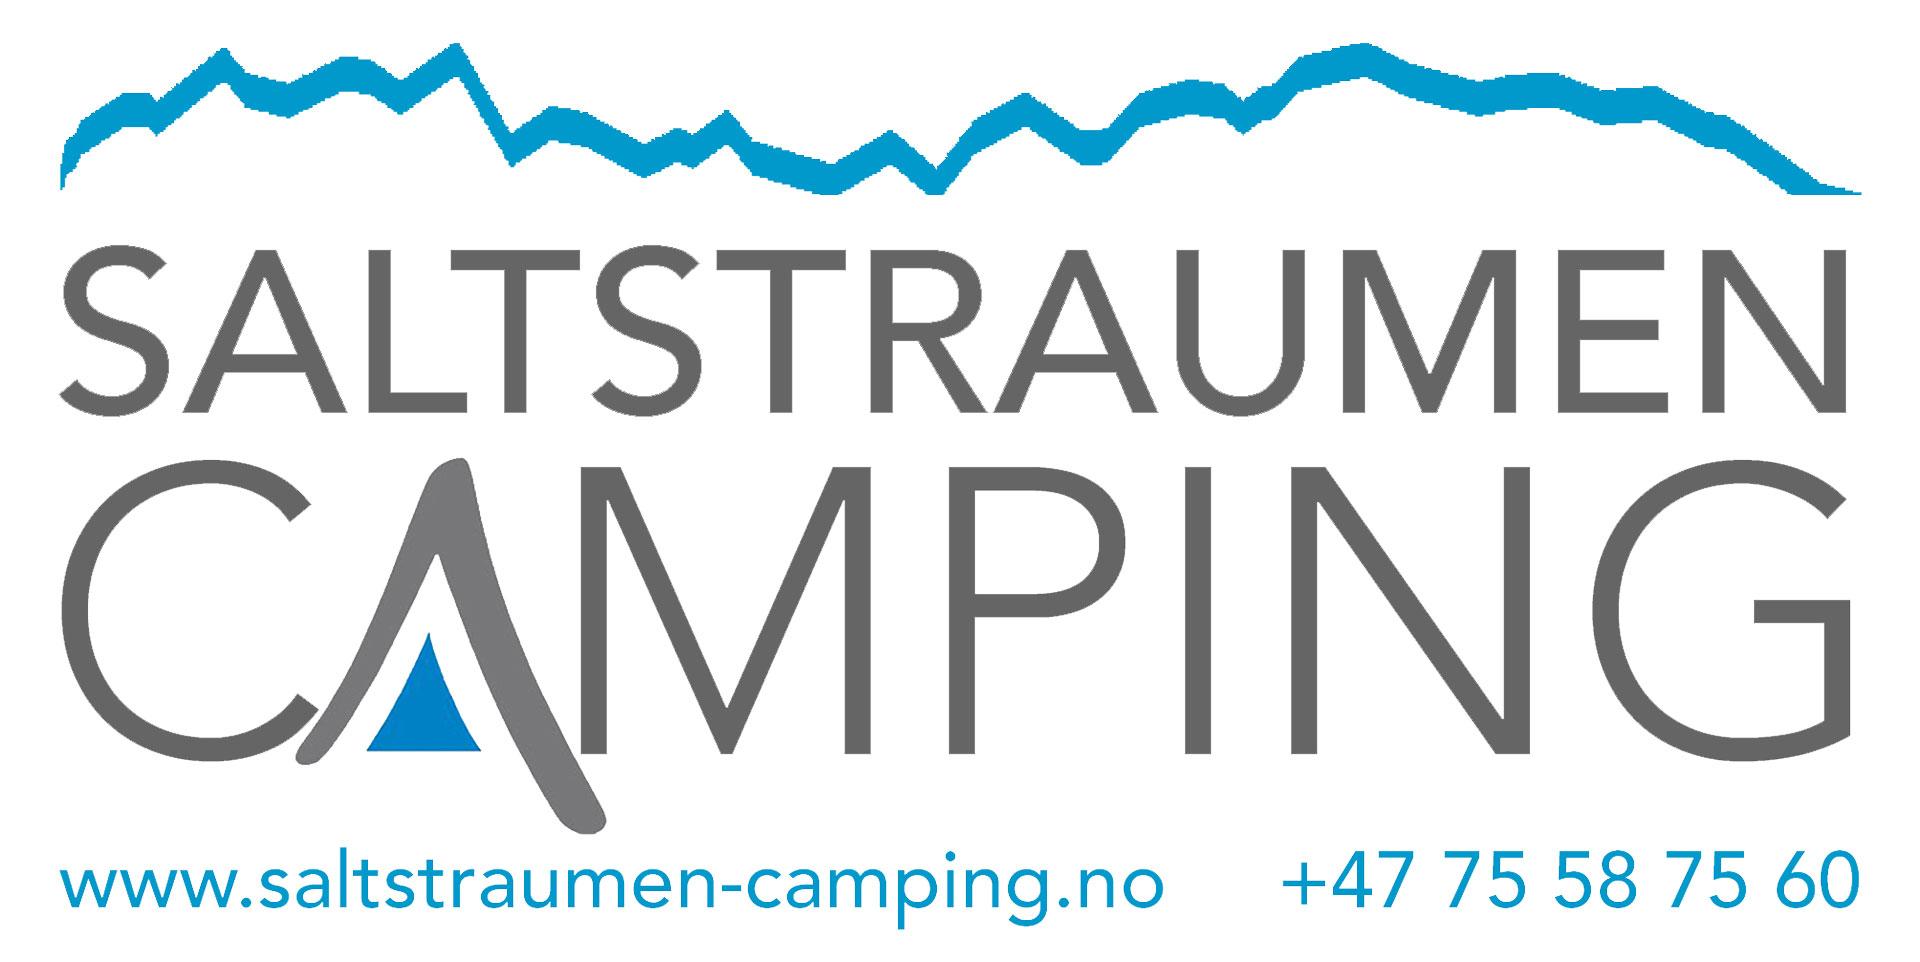 Saltstraumen Camping (Pluscamp Saltstraumen)